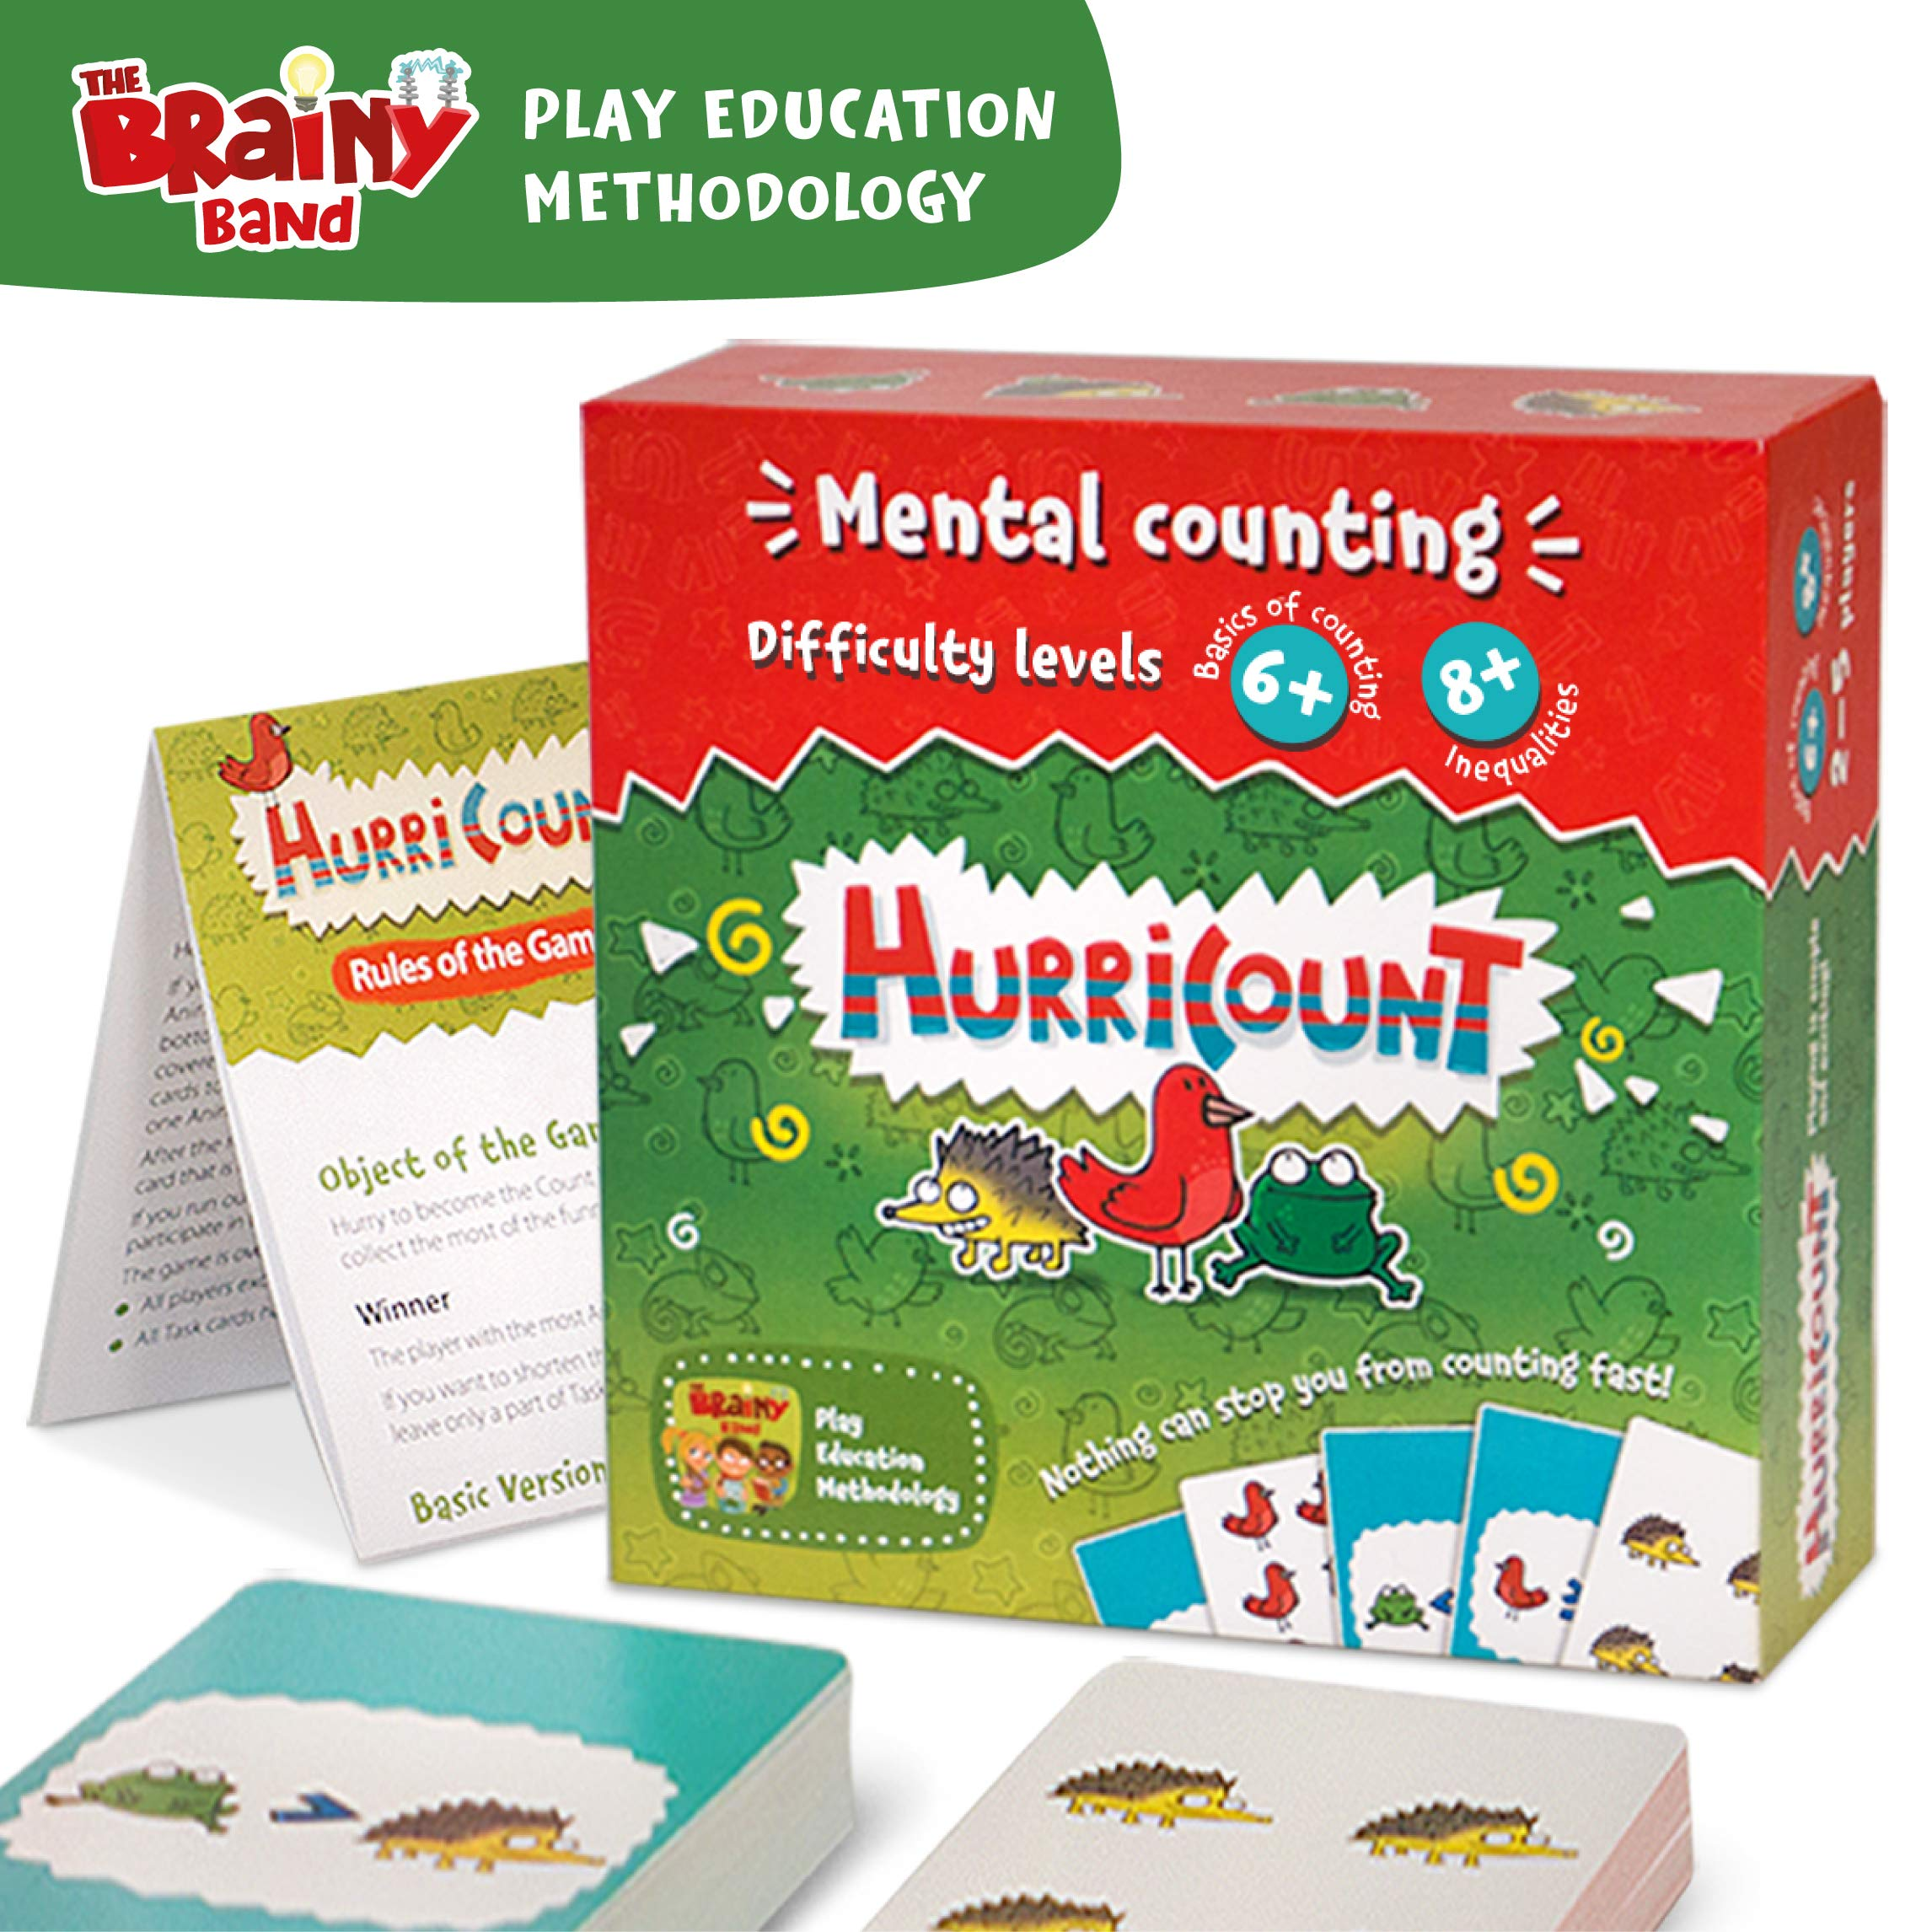 Amazon Com Fun Math Board Games For Preschoolers Counting Card Games For Kids Kids Games Ages 6 And Up Family Board Games Kindergarten Math Toys Games